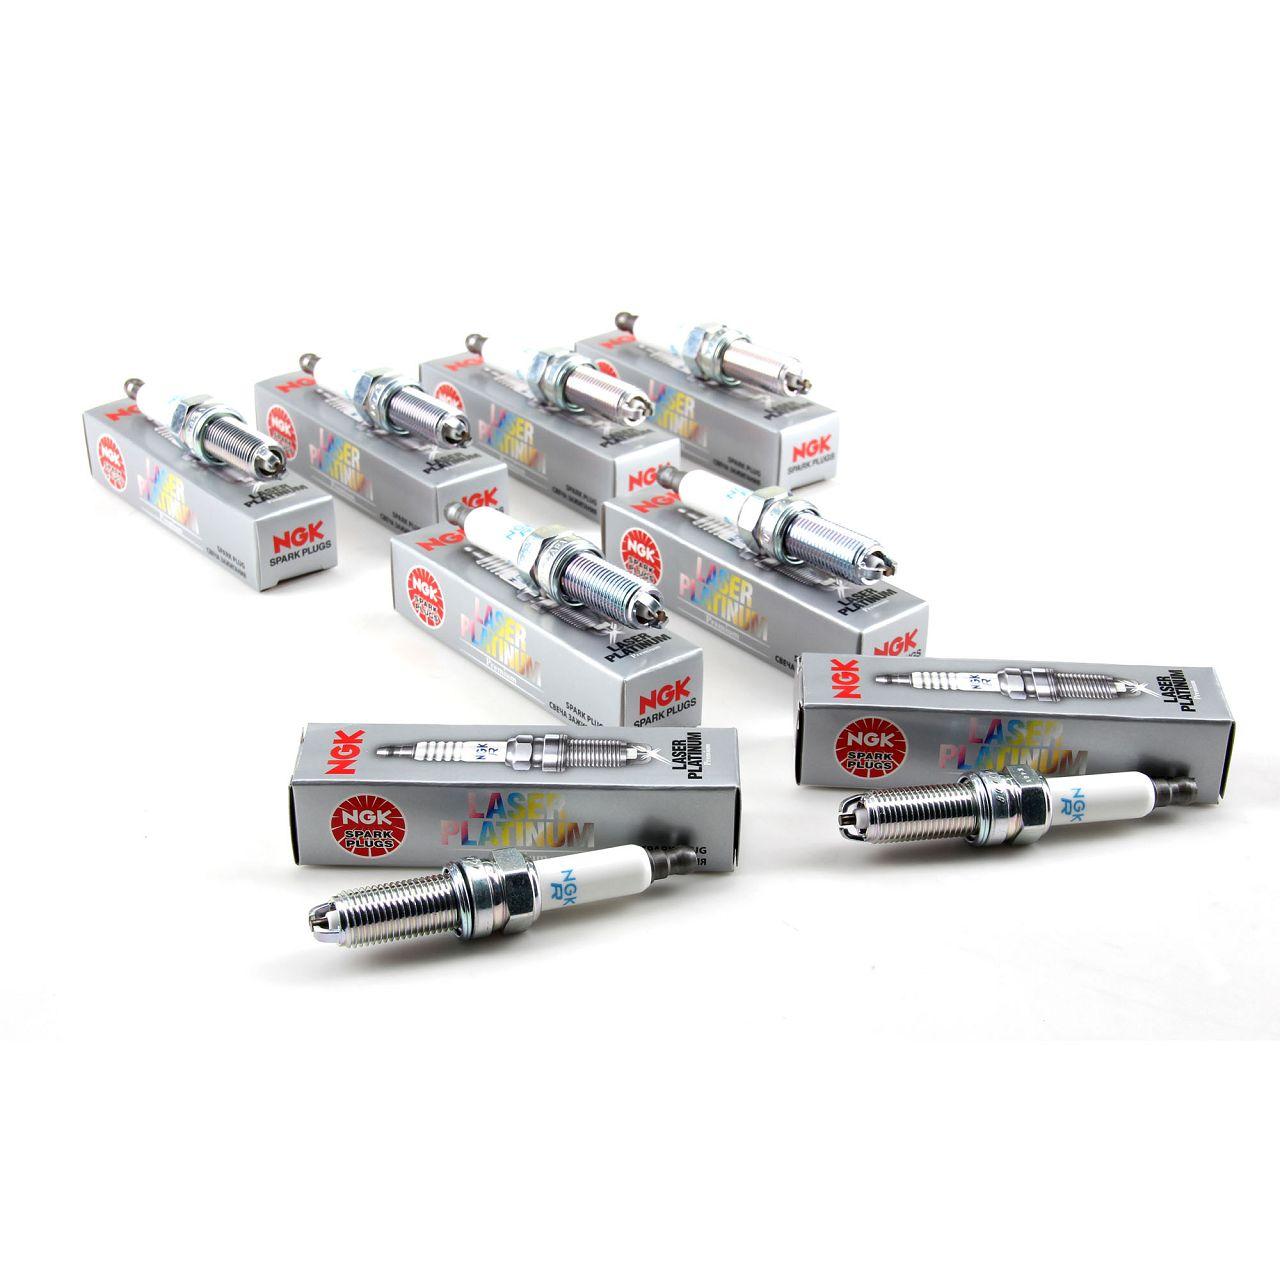 8x NGK Zündkerzen Laser Platinum 4471 LKR8AP für BMW E93 E92 M3 E60 E61 M5